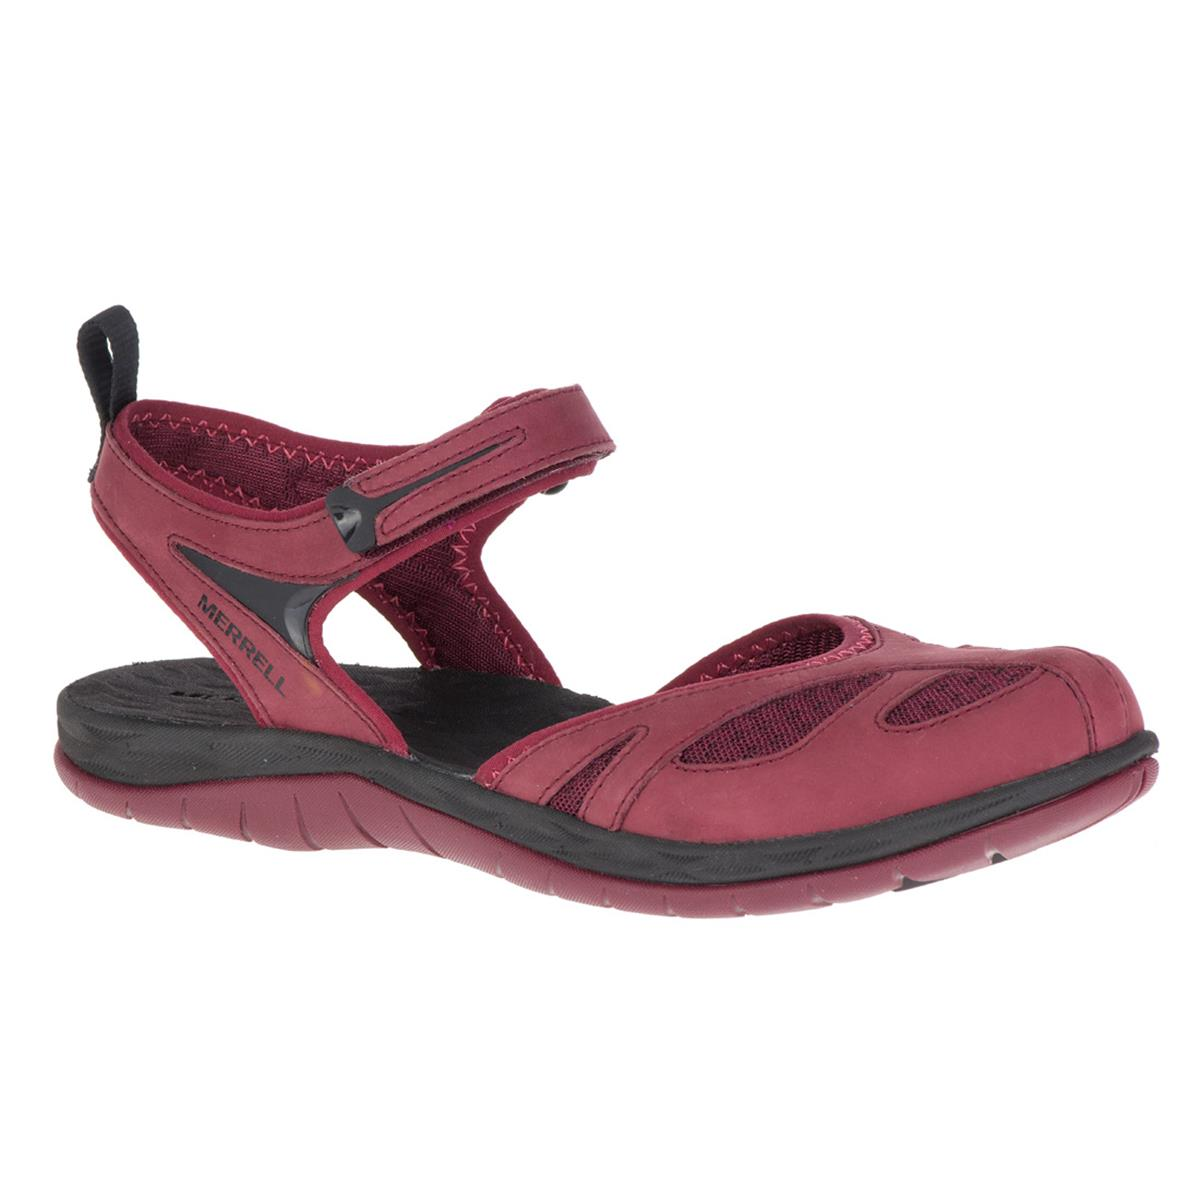 09757f64ccff Merrell Siren Wrap Q2 Womens Sandals (Chocolate Truffle ...